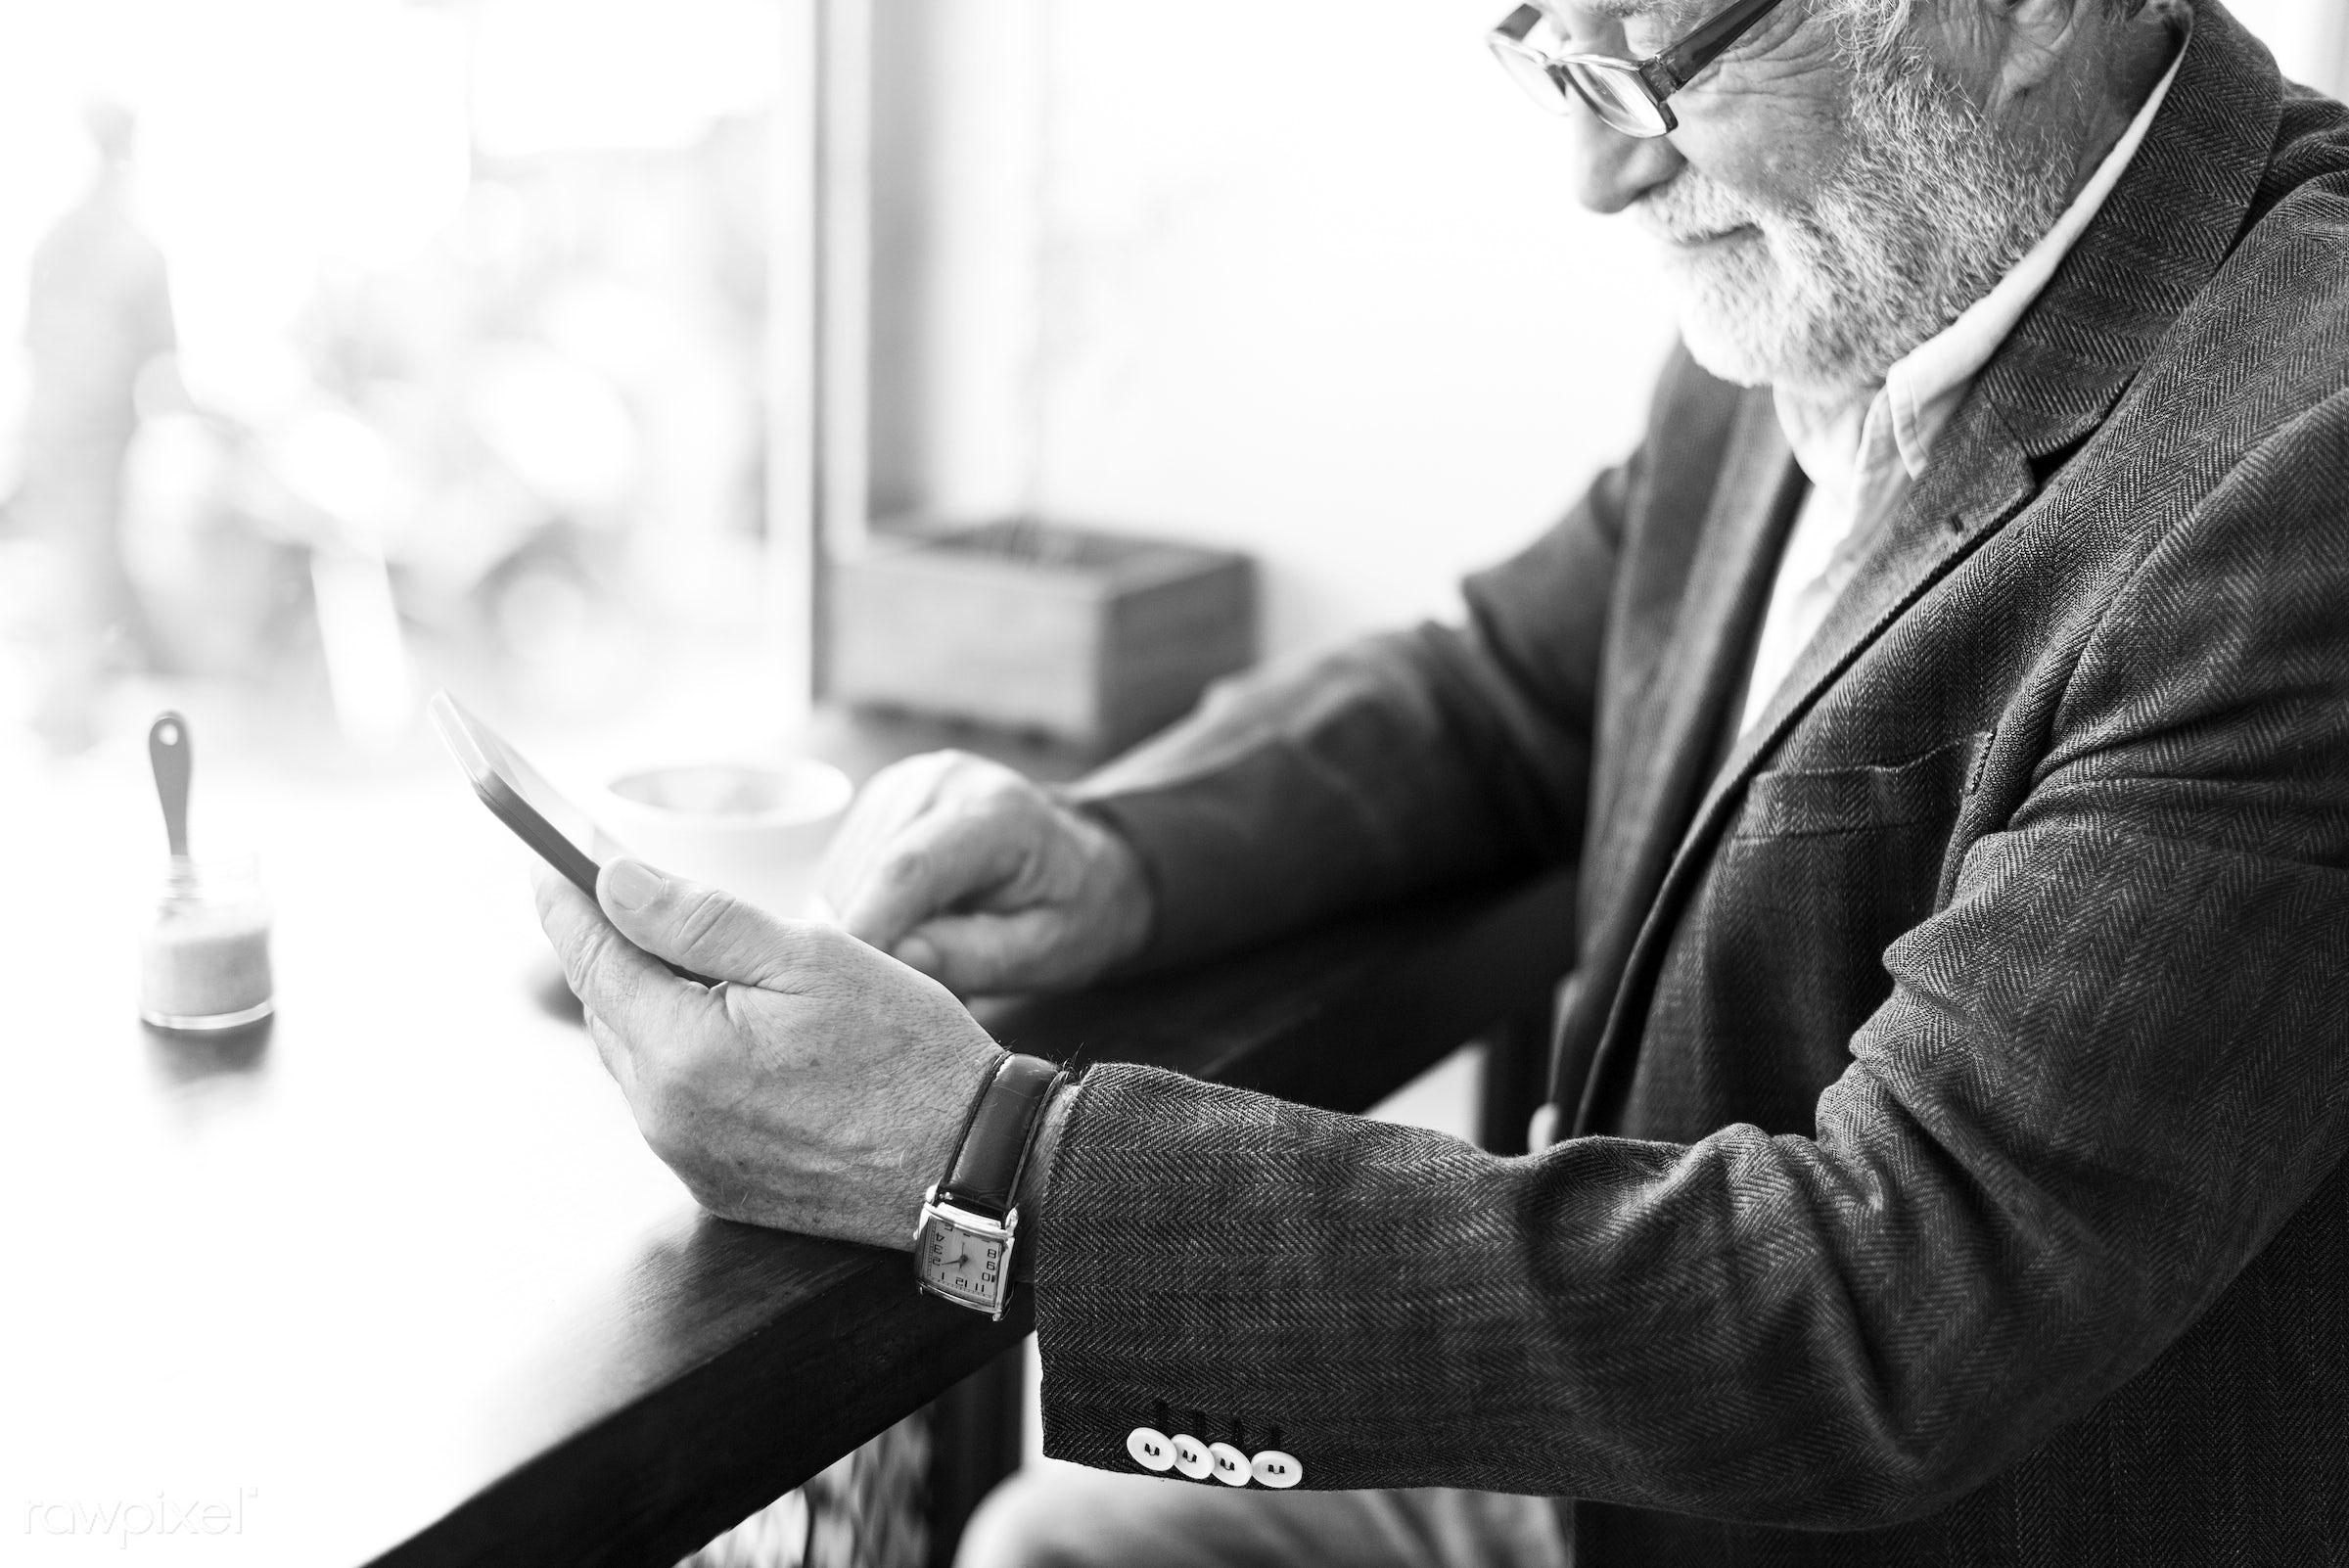 Elderly man is using digital tablet - alone, beard, casual, caucasian, communication, connection, device, digital, elderly,...